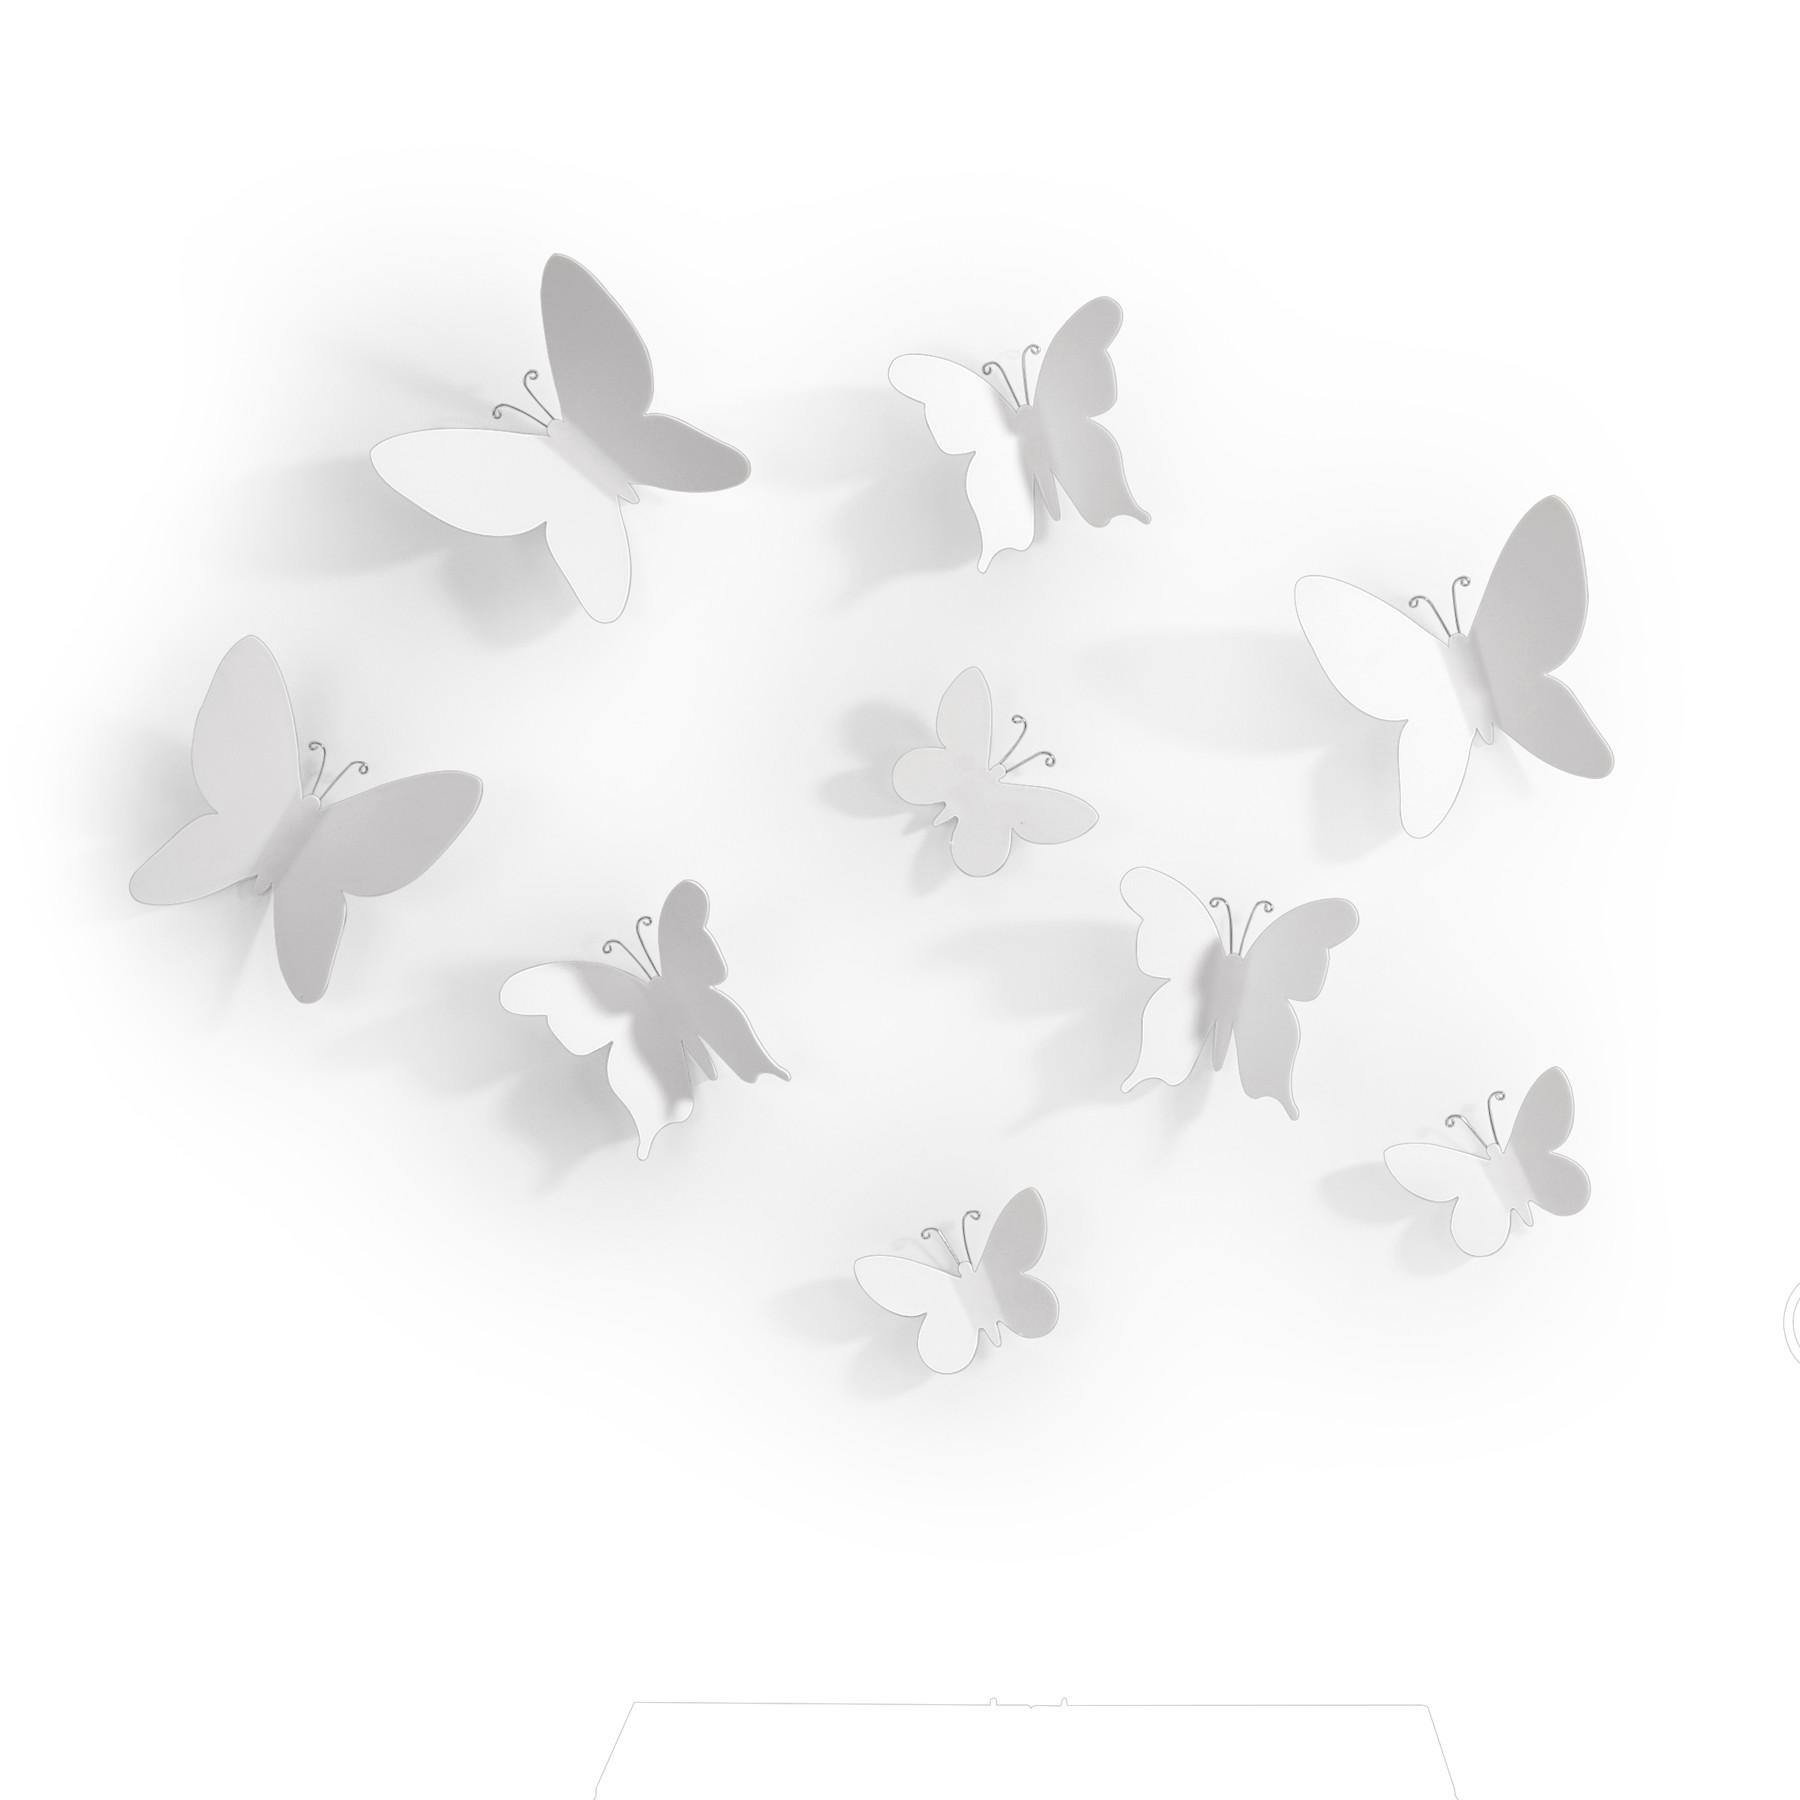 Enfeite de Parede Mariposa 50 cm Branco - Umbra